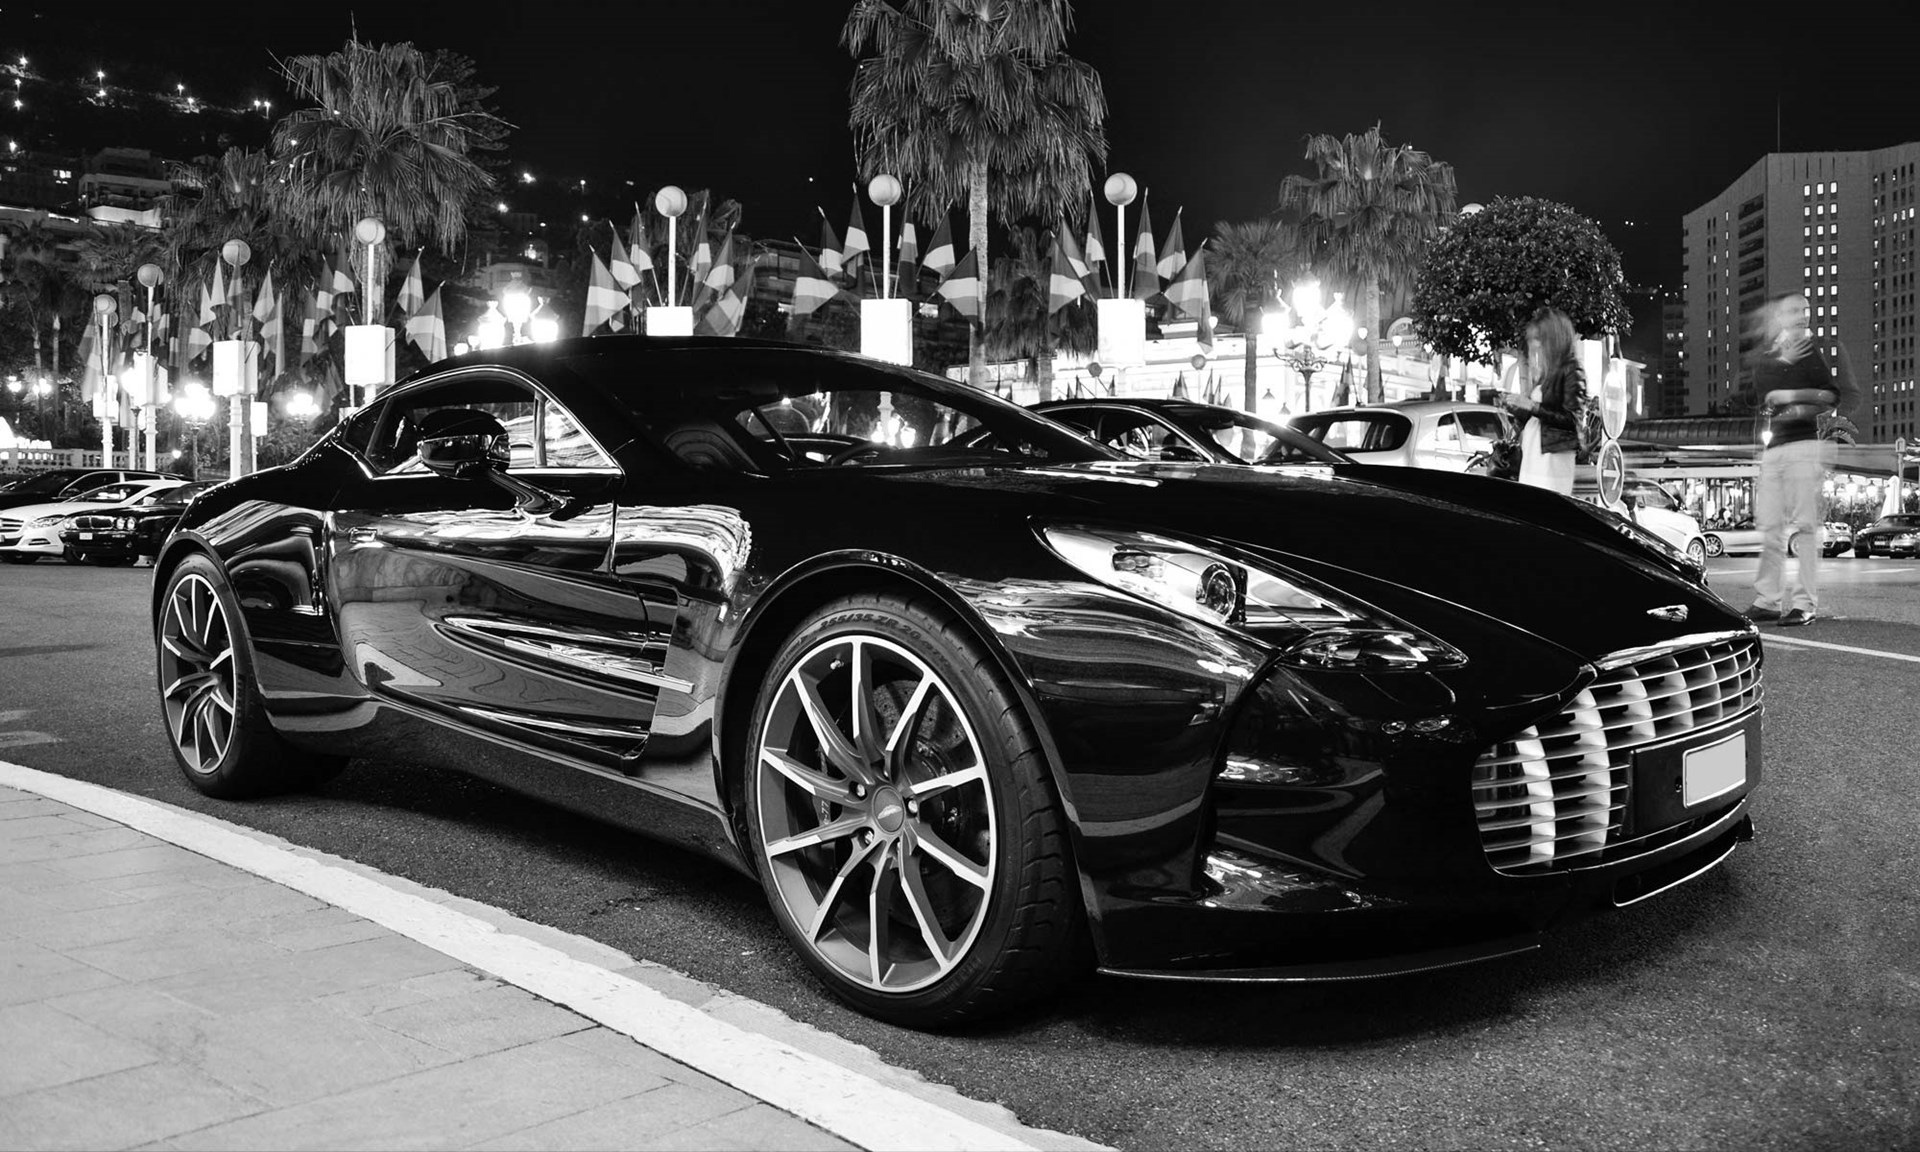 Aston Martin Insurance Prestige Luxury Car Insurance